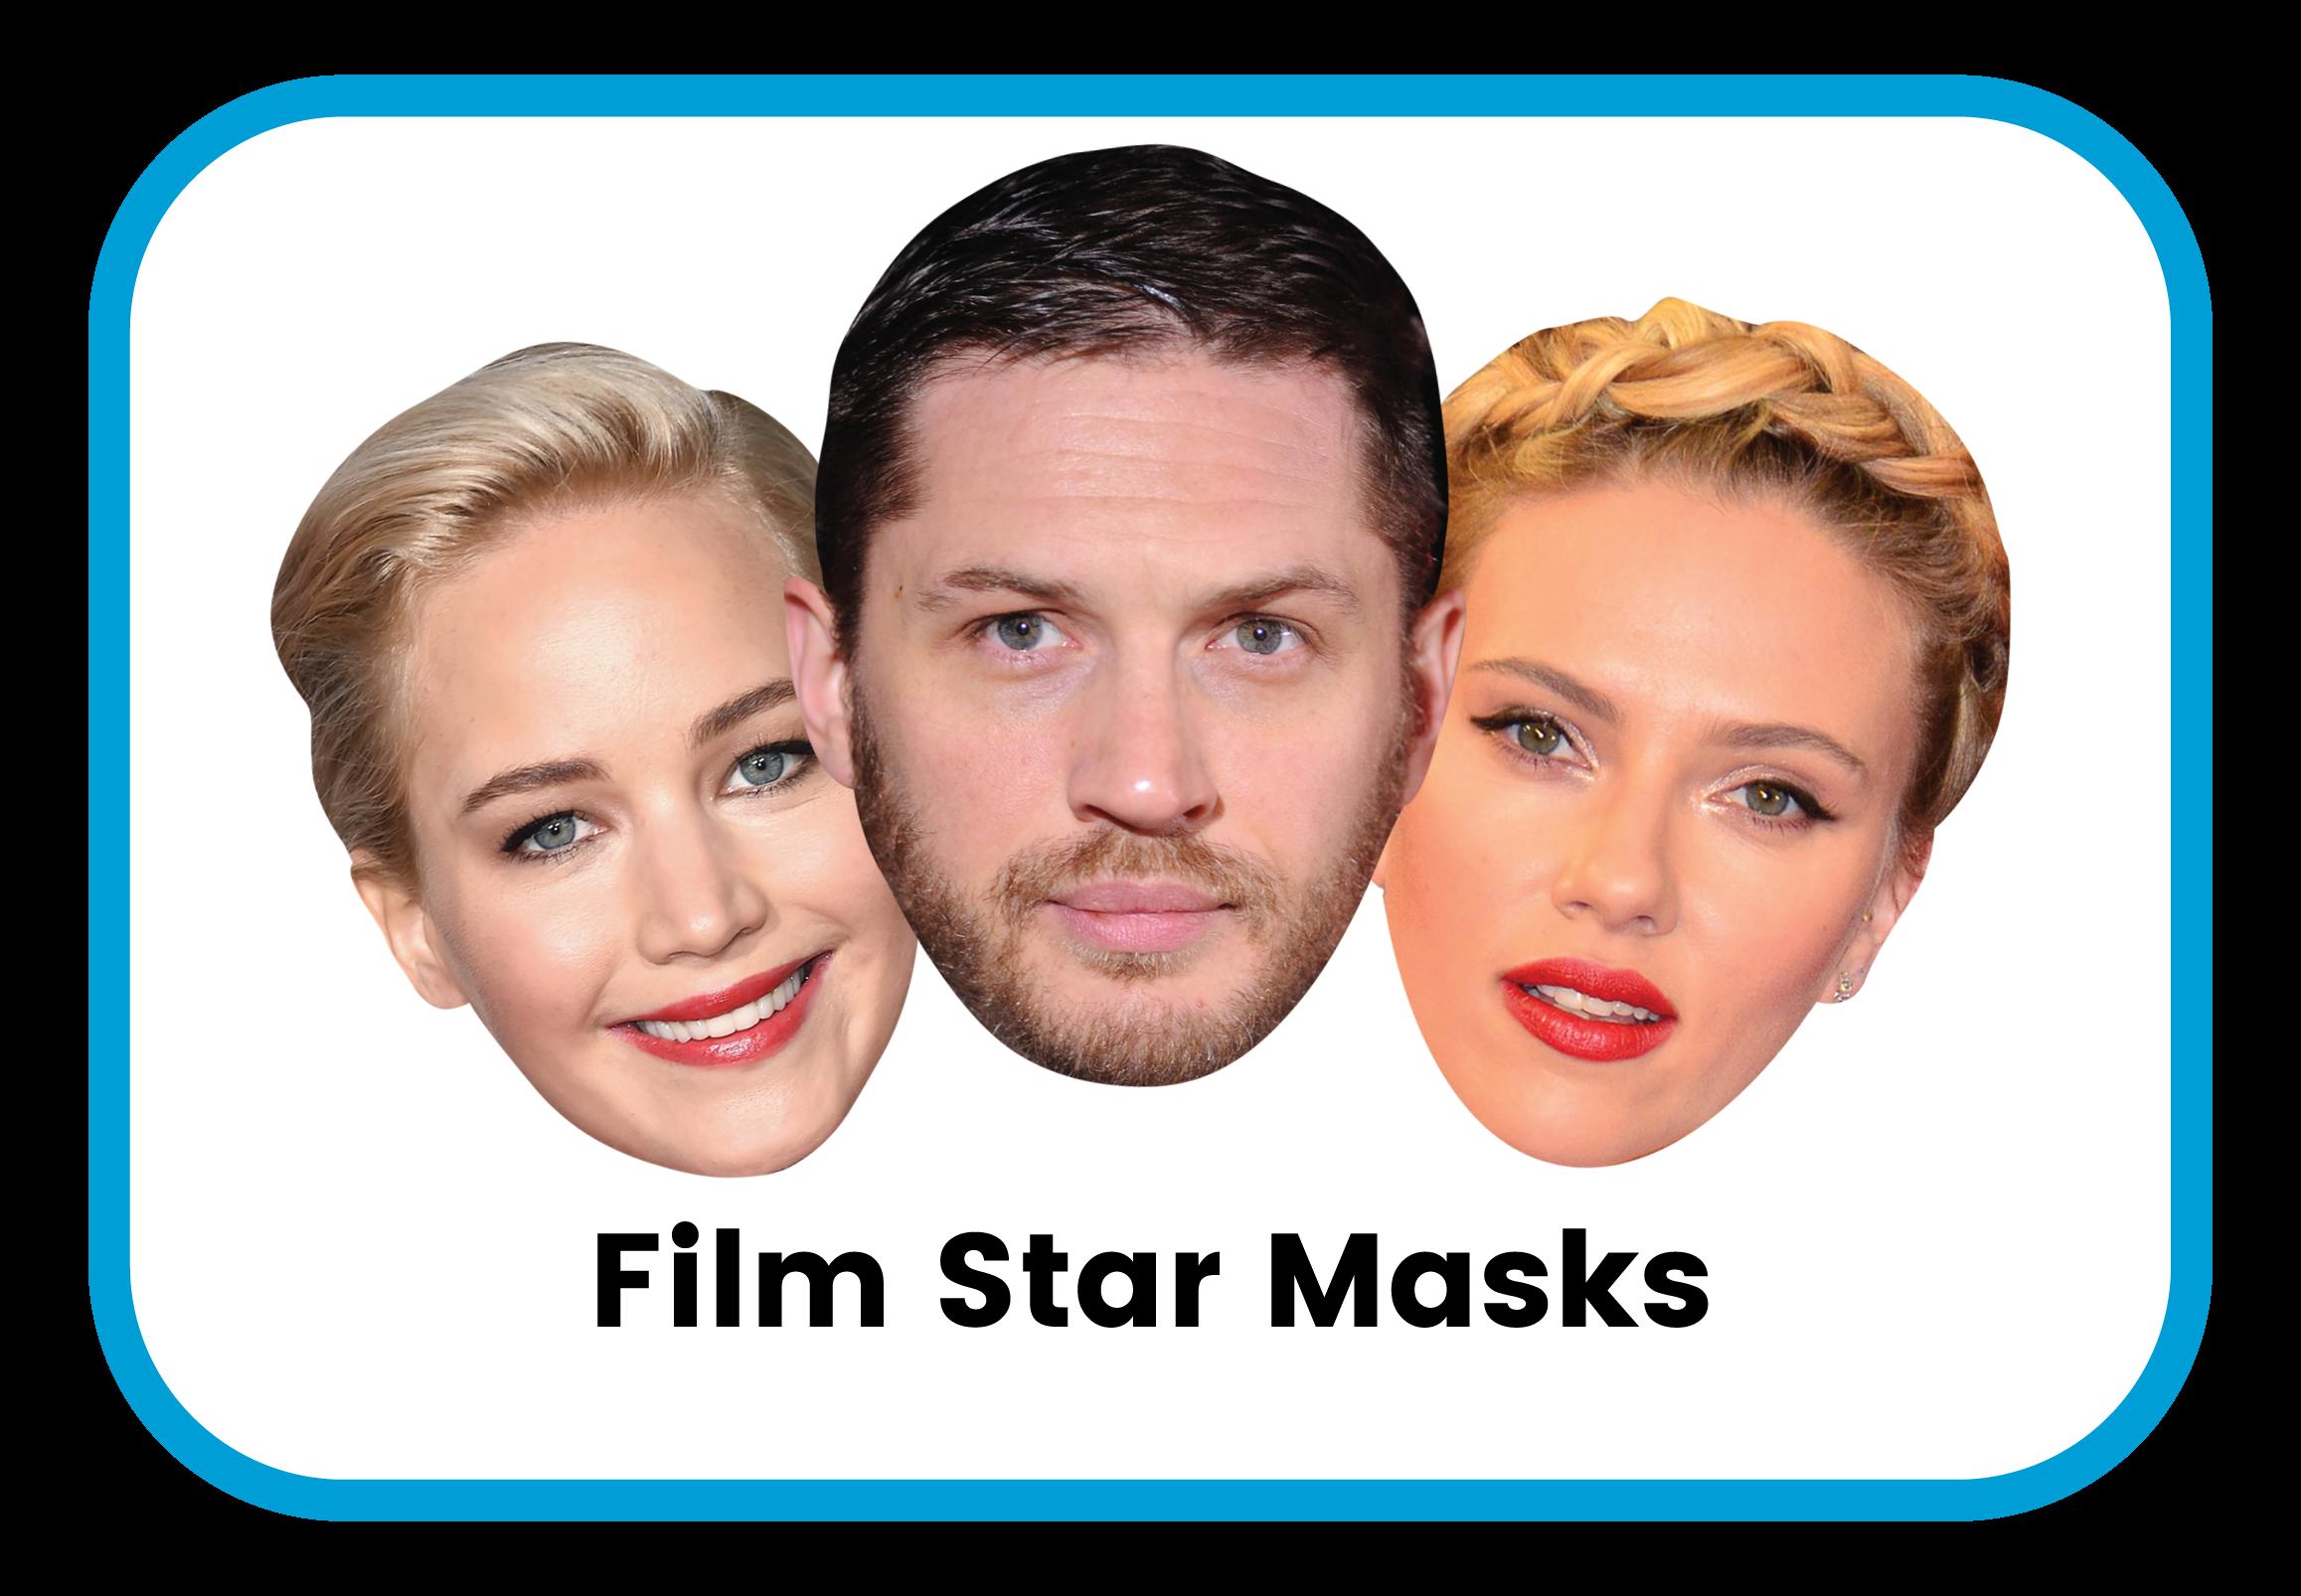 Film Star cardboard masks